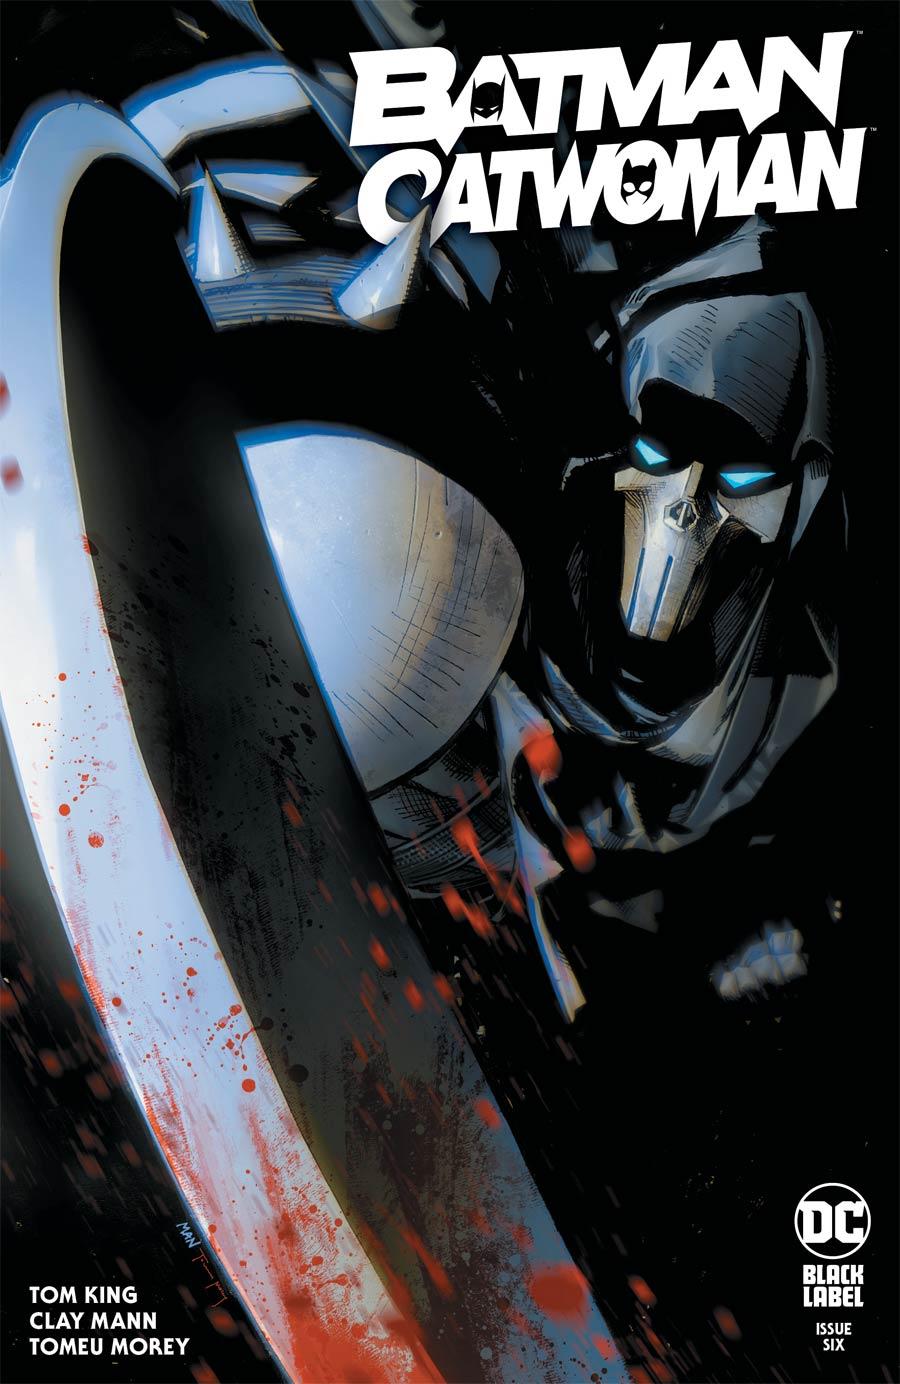 Batman Catwoman #6 Cover A Regular Clay Mann Cover